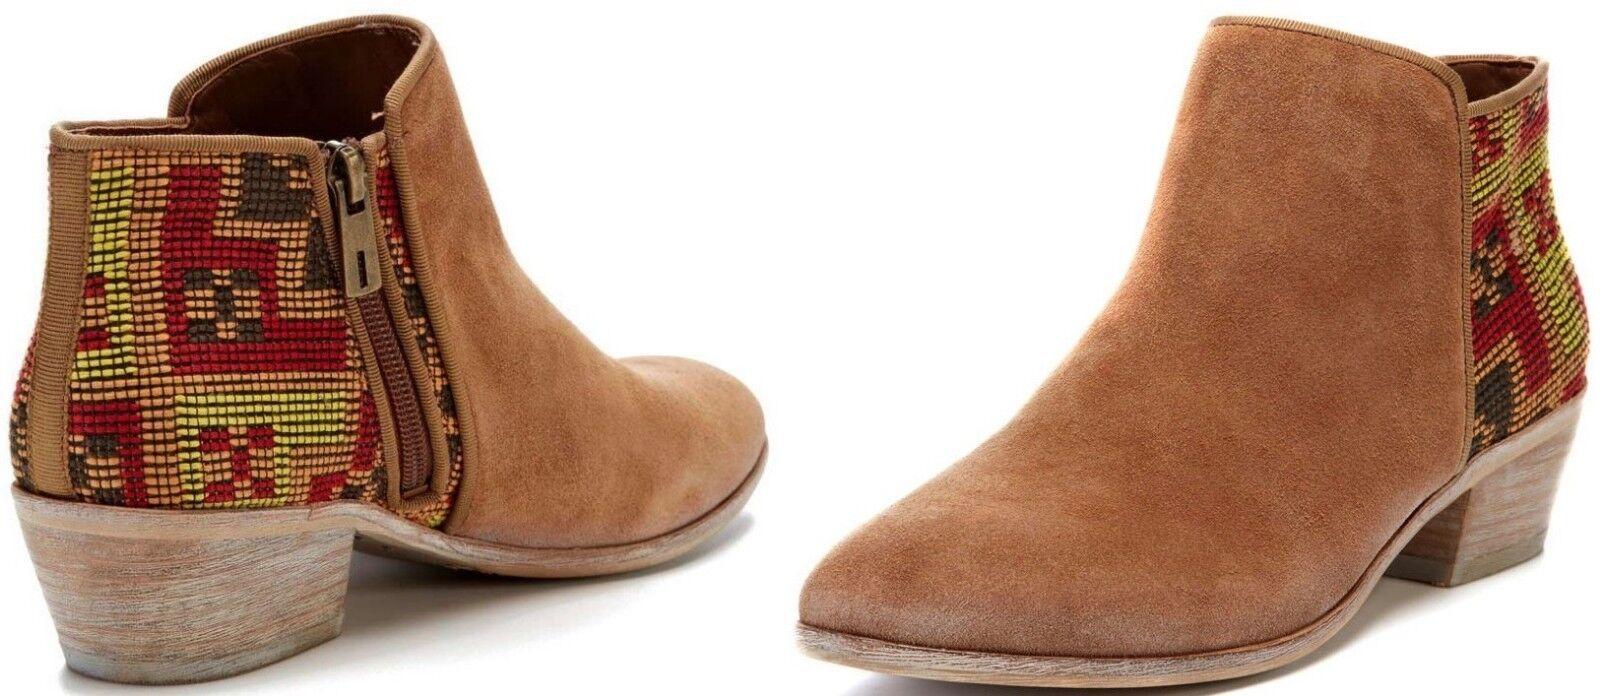 Wouomo Sam Edelman Putnam avvioie Saddle Aztec ankle Suede avvio Stacked heel NEW